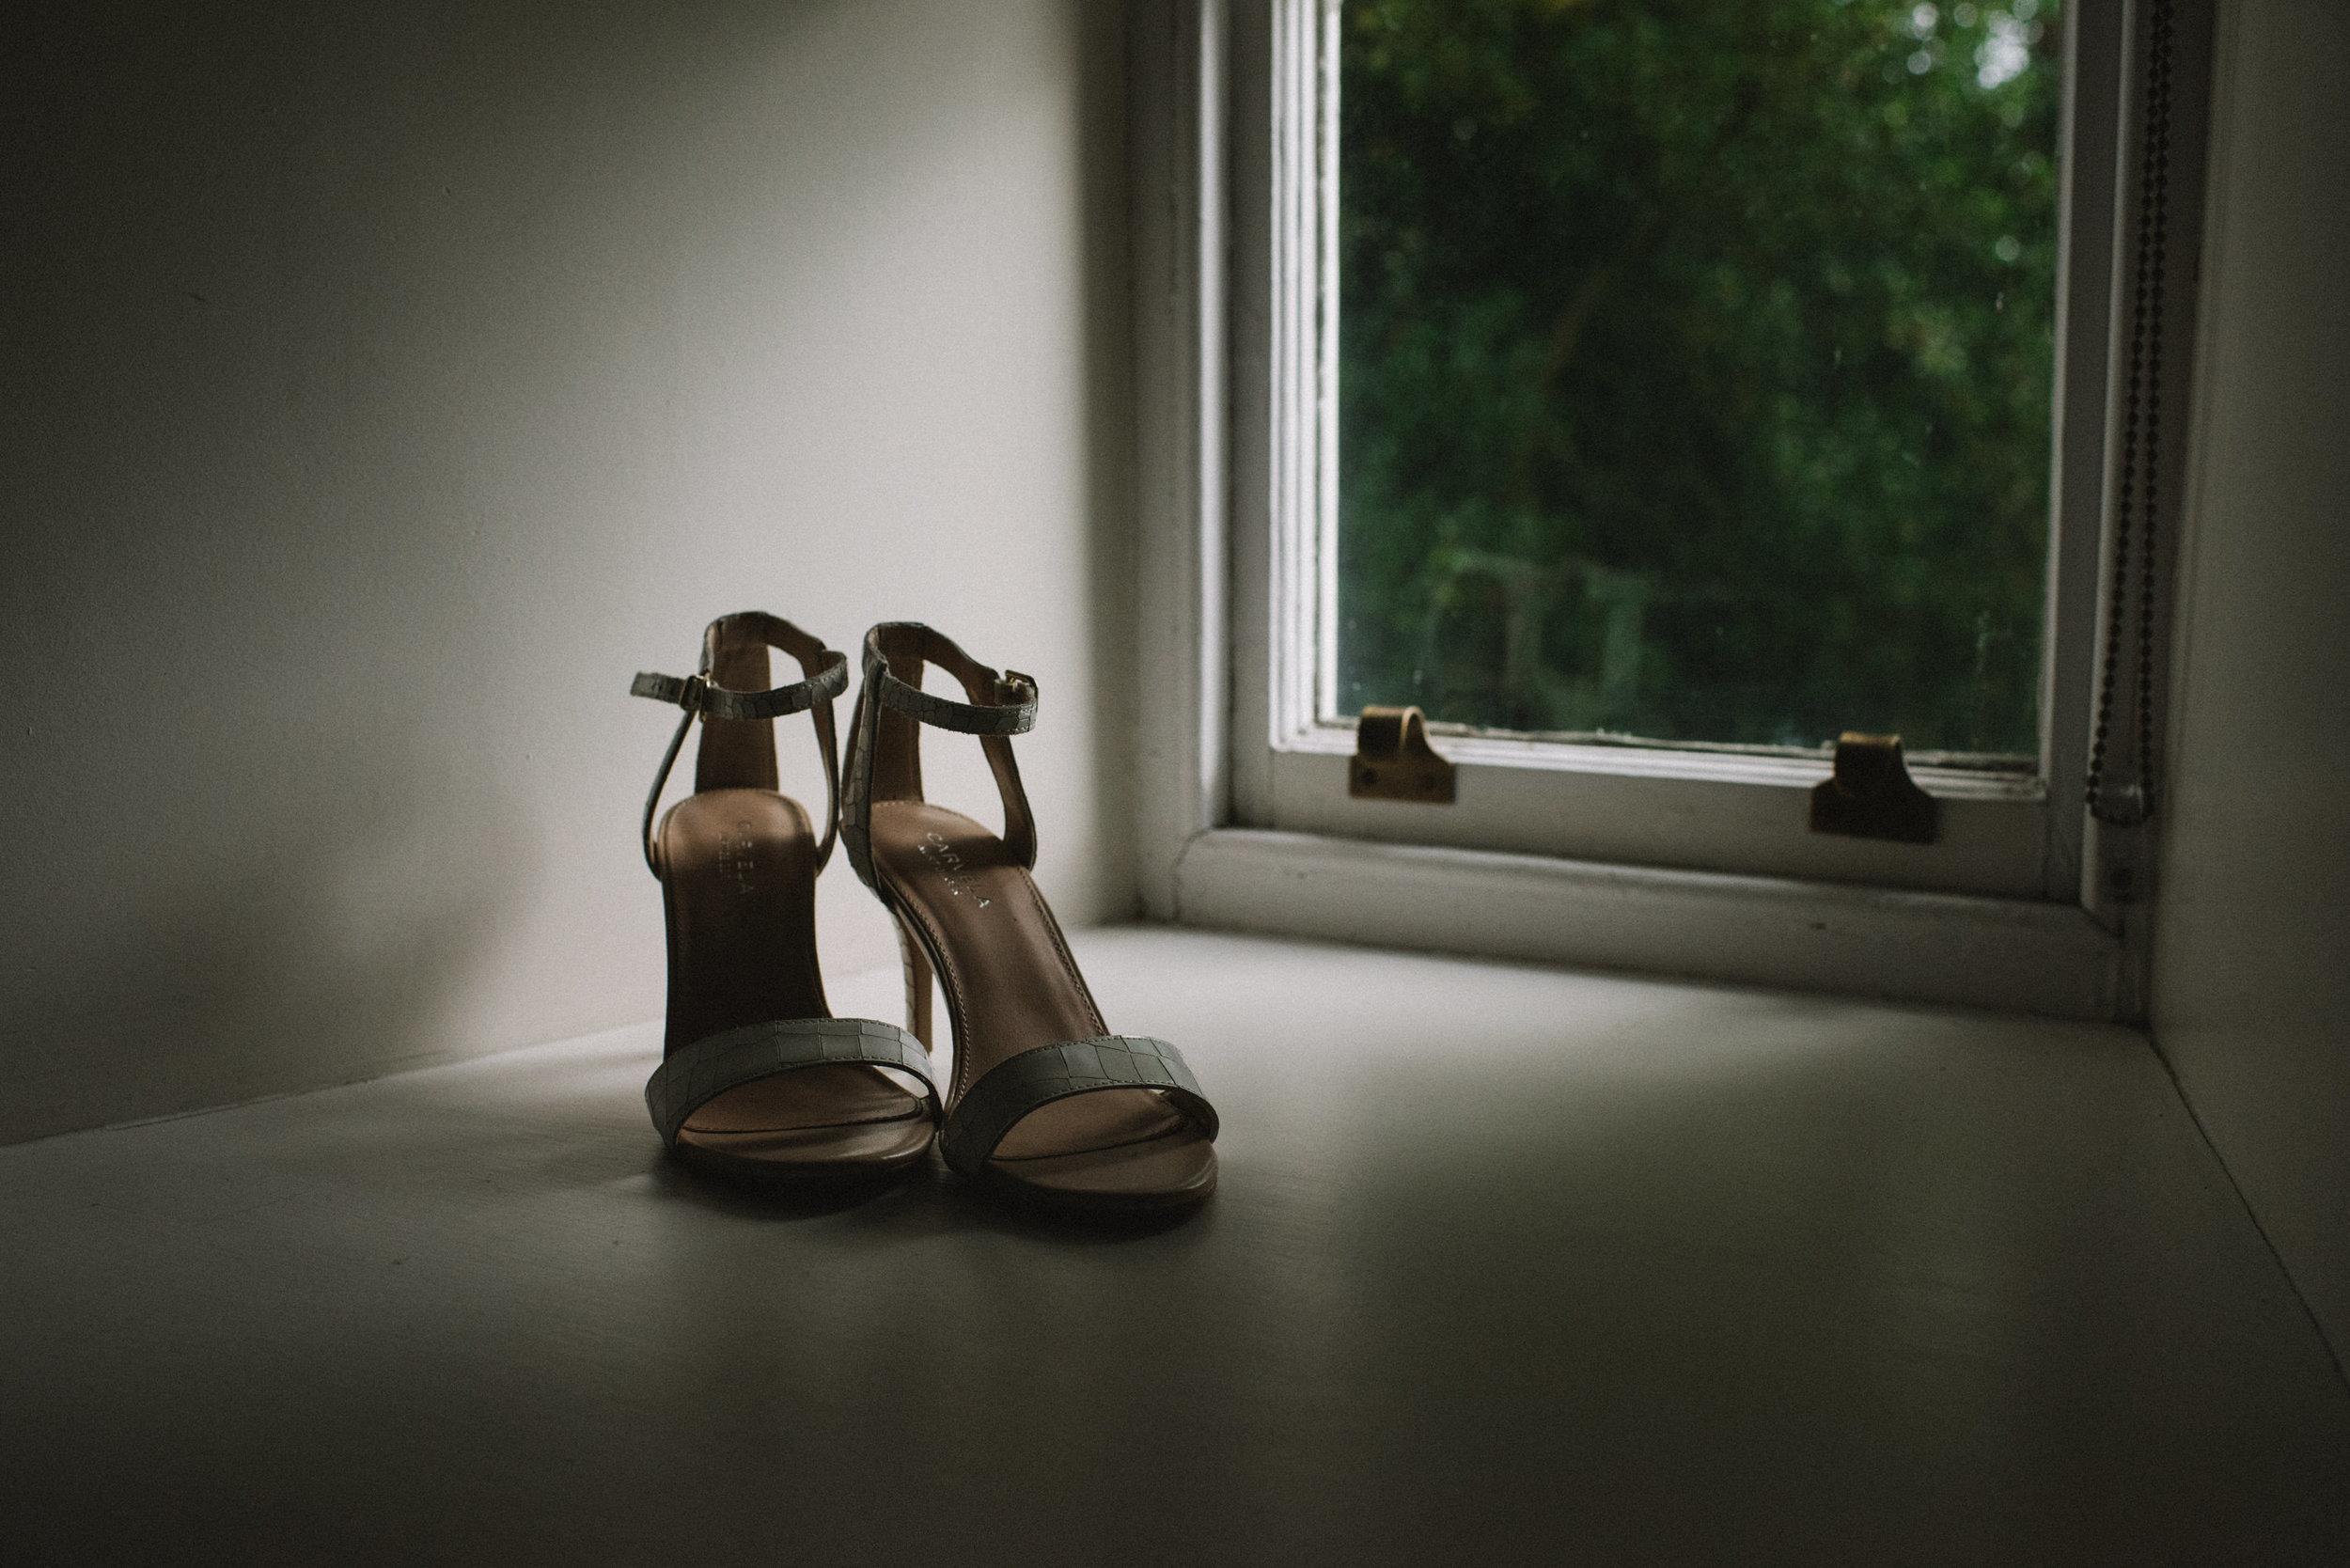 0046-LISA-DEVINE-PHOTOGRAPHY-ALTERNATIVE-WEDDING-PHOTOGRAPHY-SCOTLAND-DESTINATION-WEDDINGS-GLASGOW-WEDDINGS-COOL-WEDDINGS-STYLISH-WEDDINGS.JPG